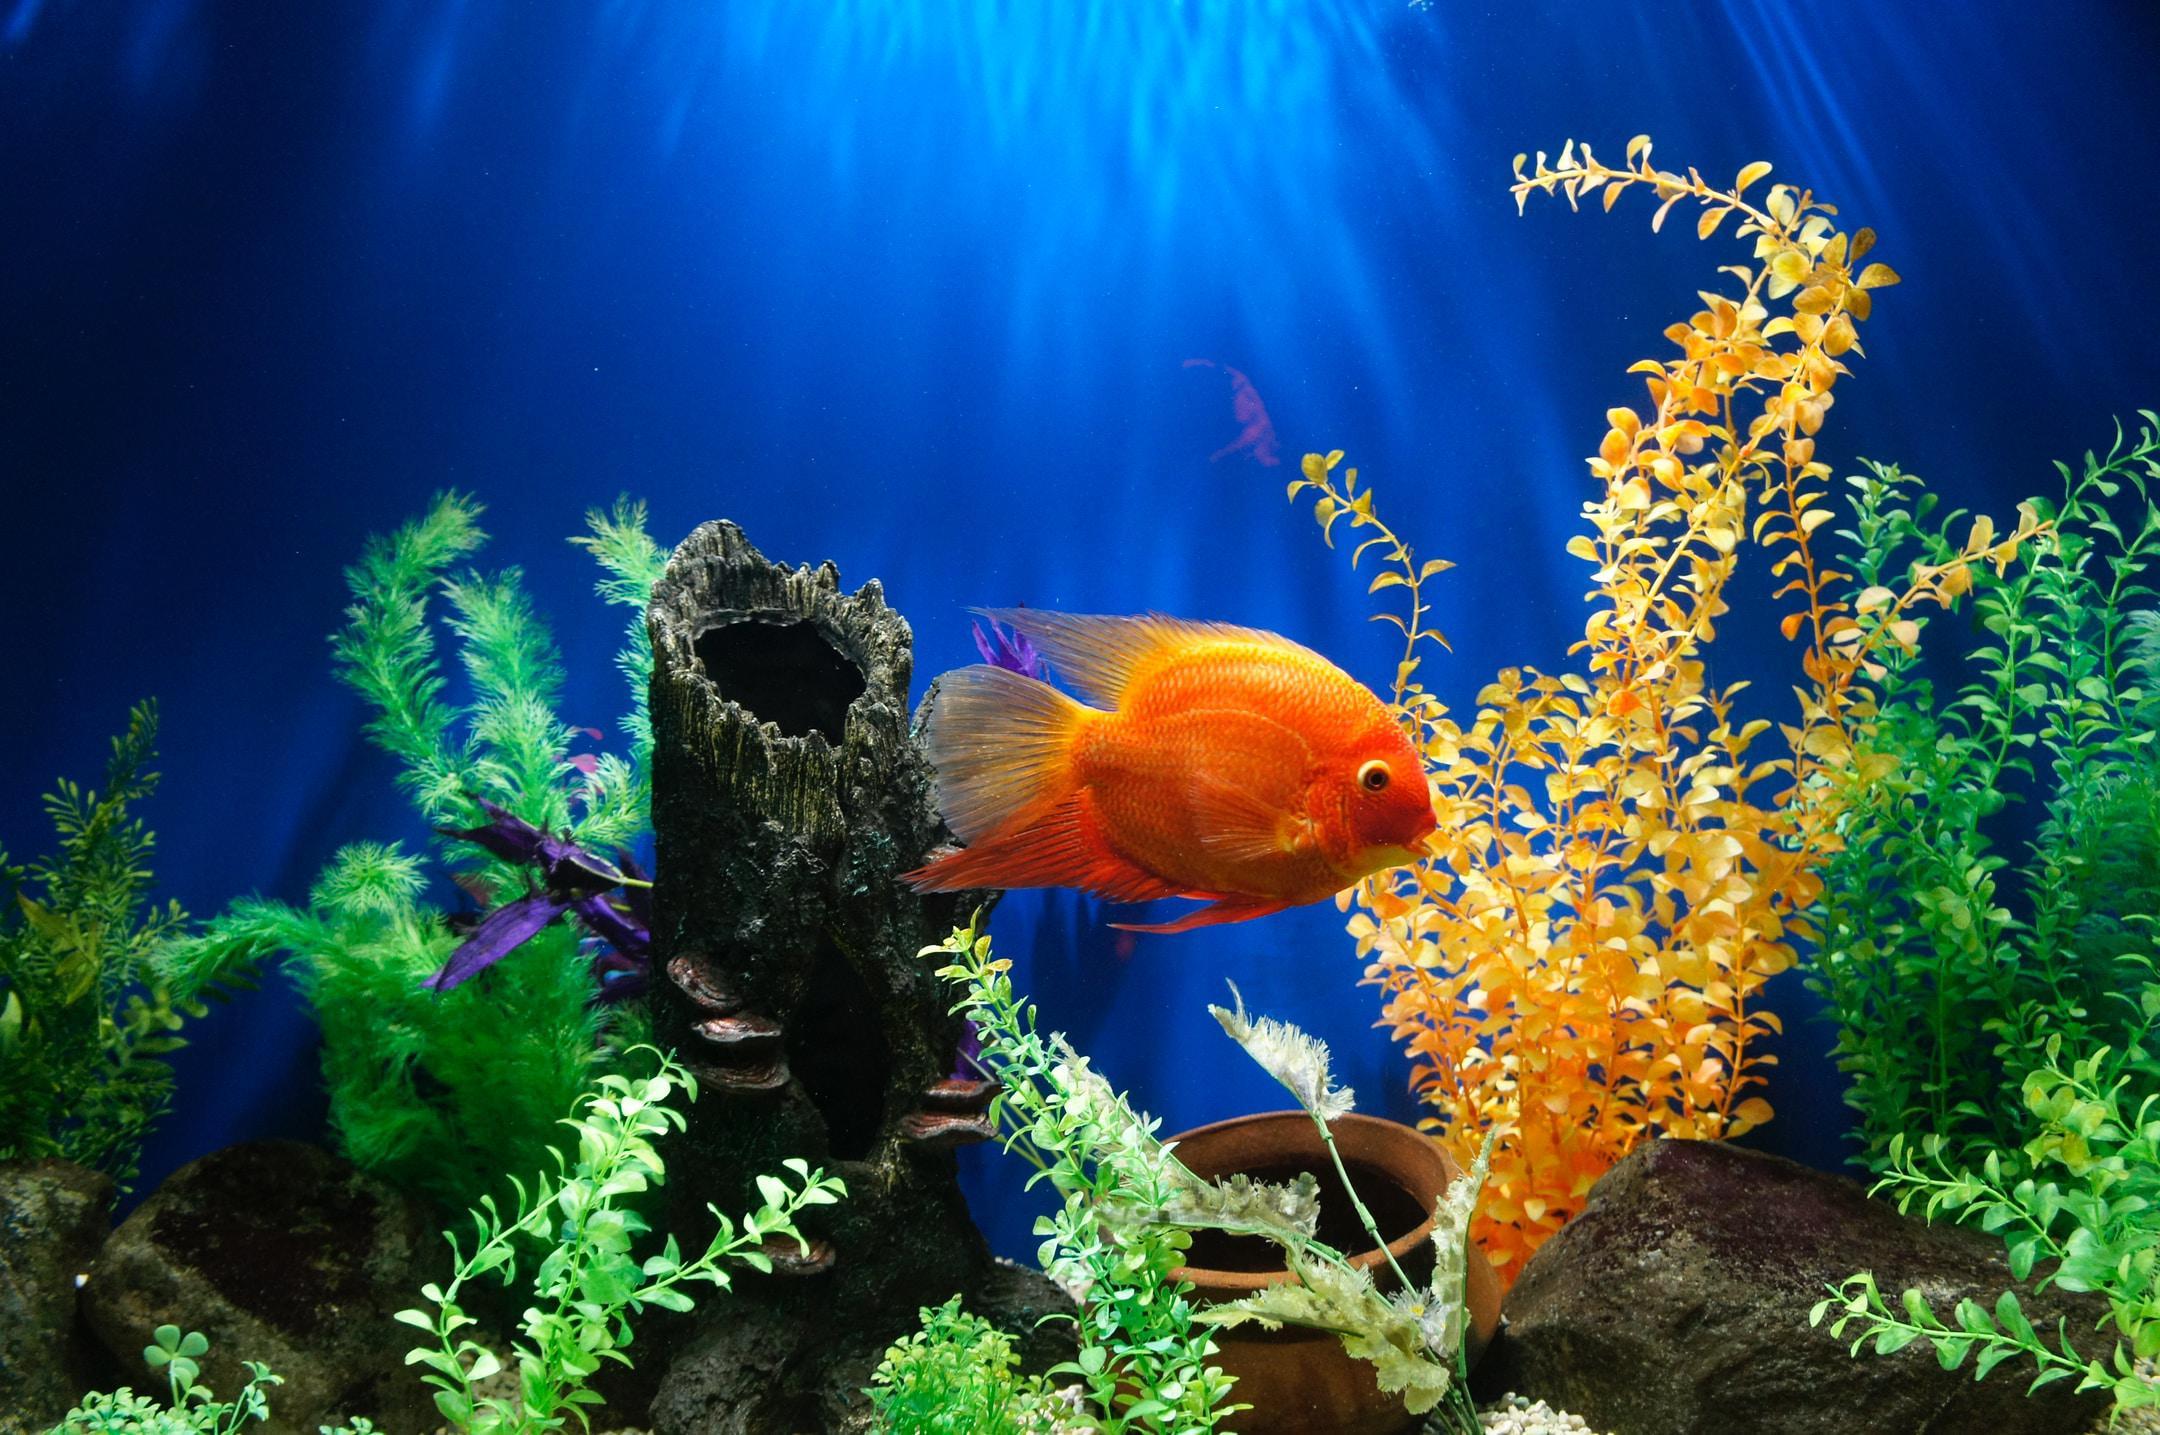 Goldfish swimming in a fish tank